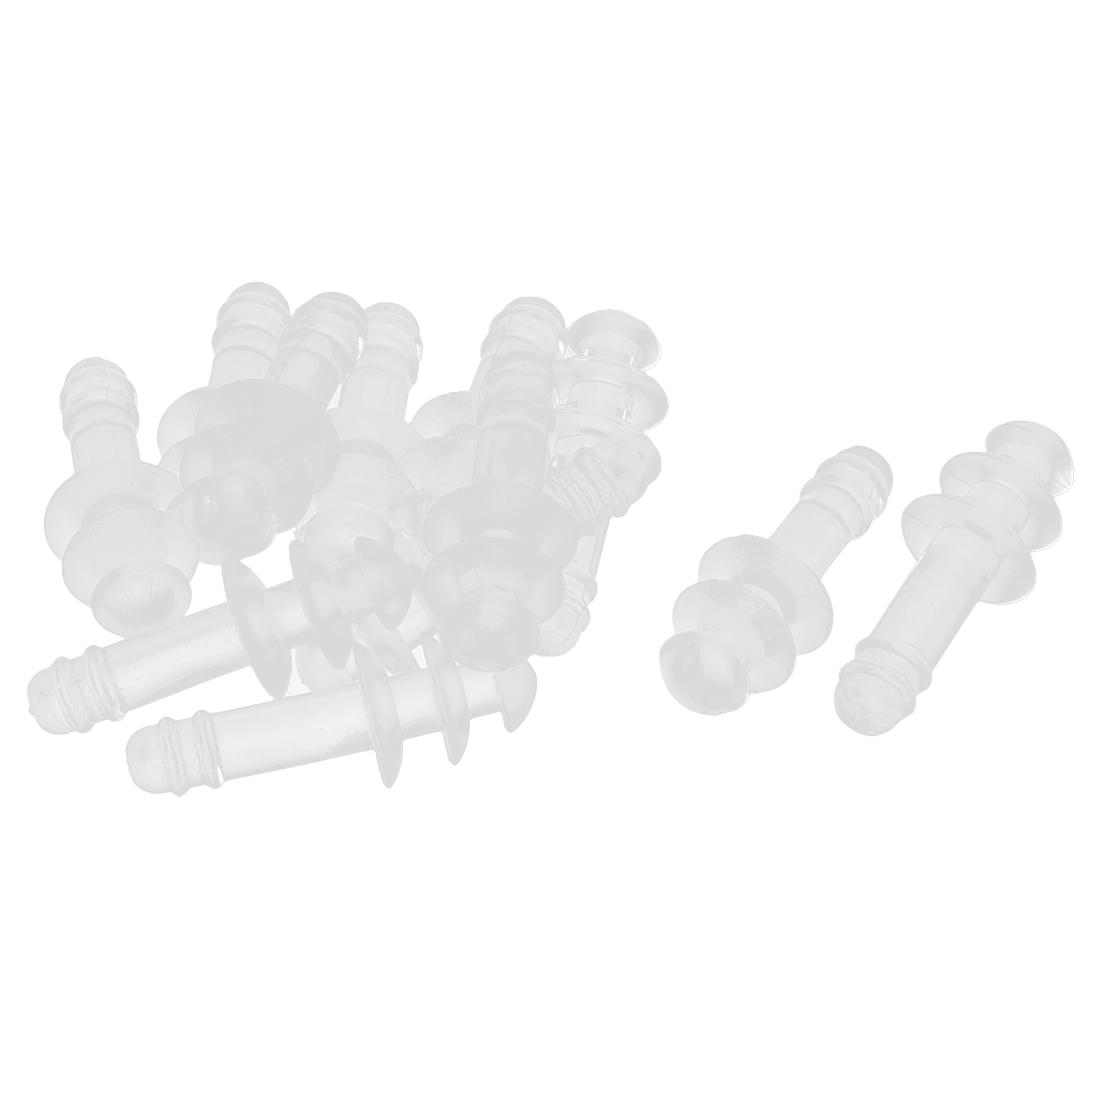 6 Pairs Clear Plastic Water Sports Swim Aqua Sphere Earplugs Protector